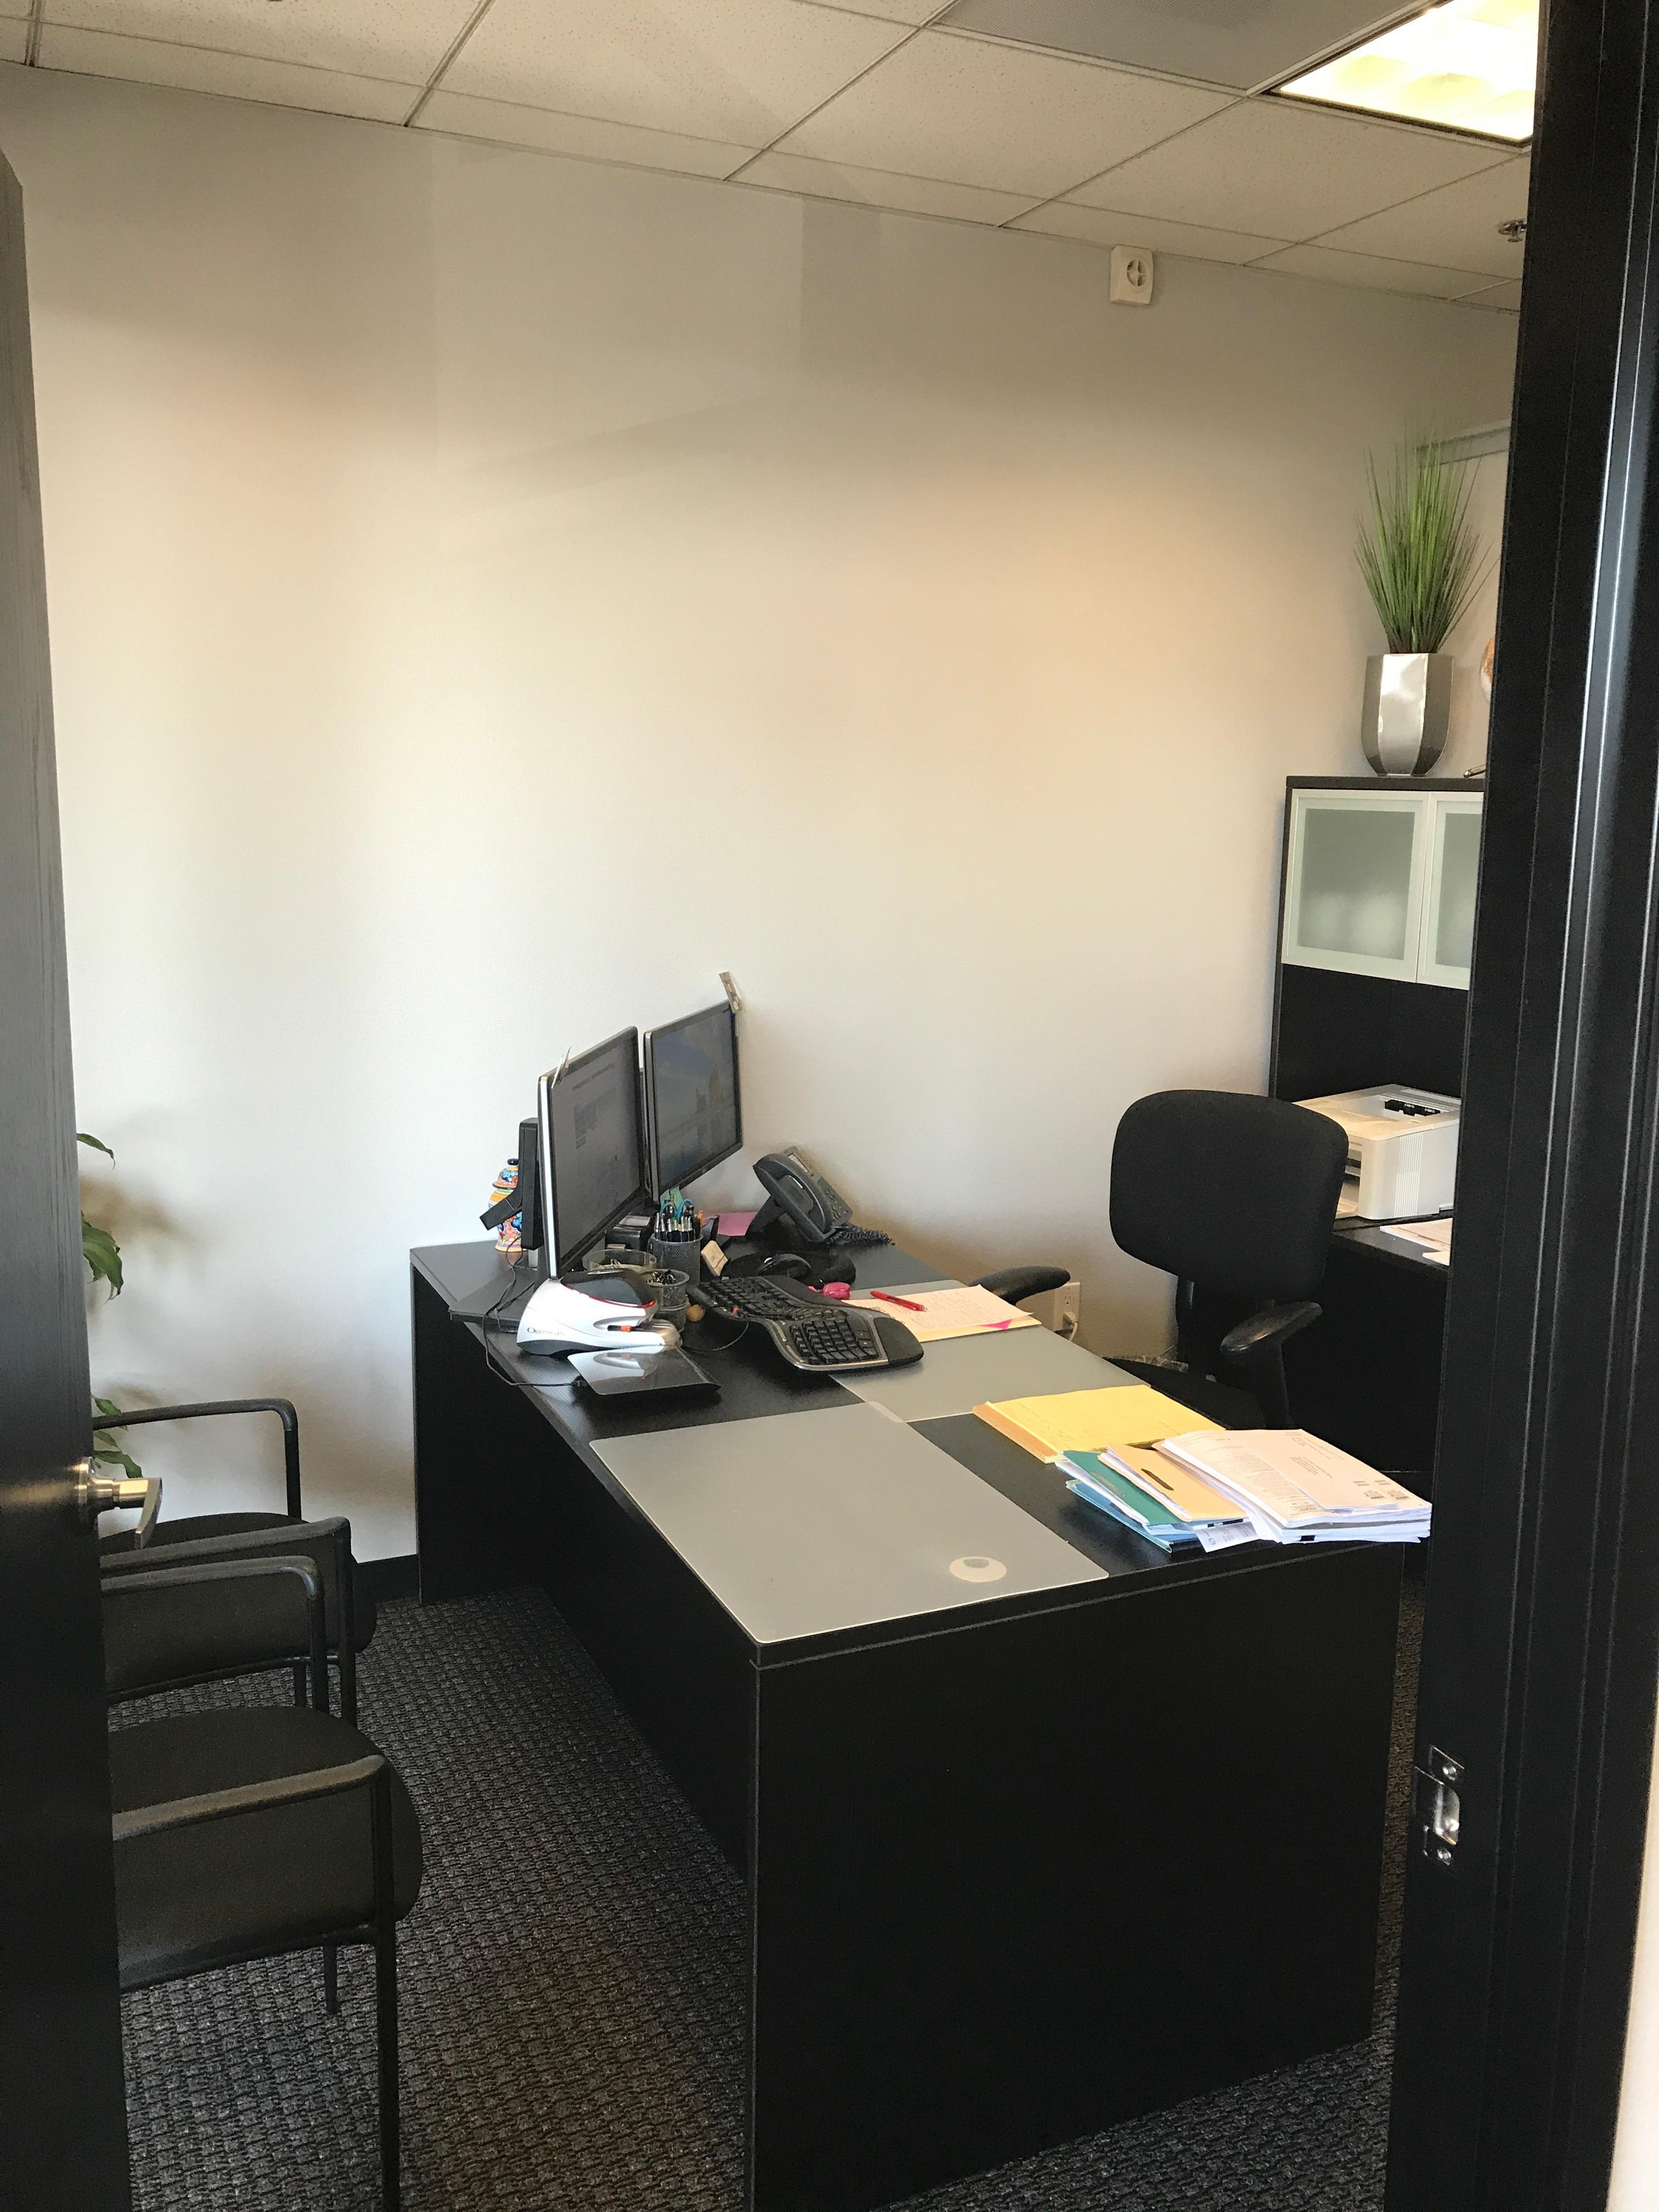 OC Legal Self-Help Center image 0